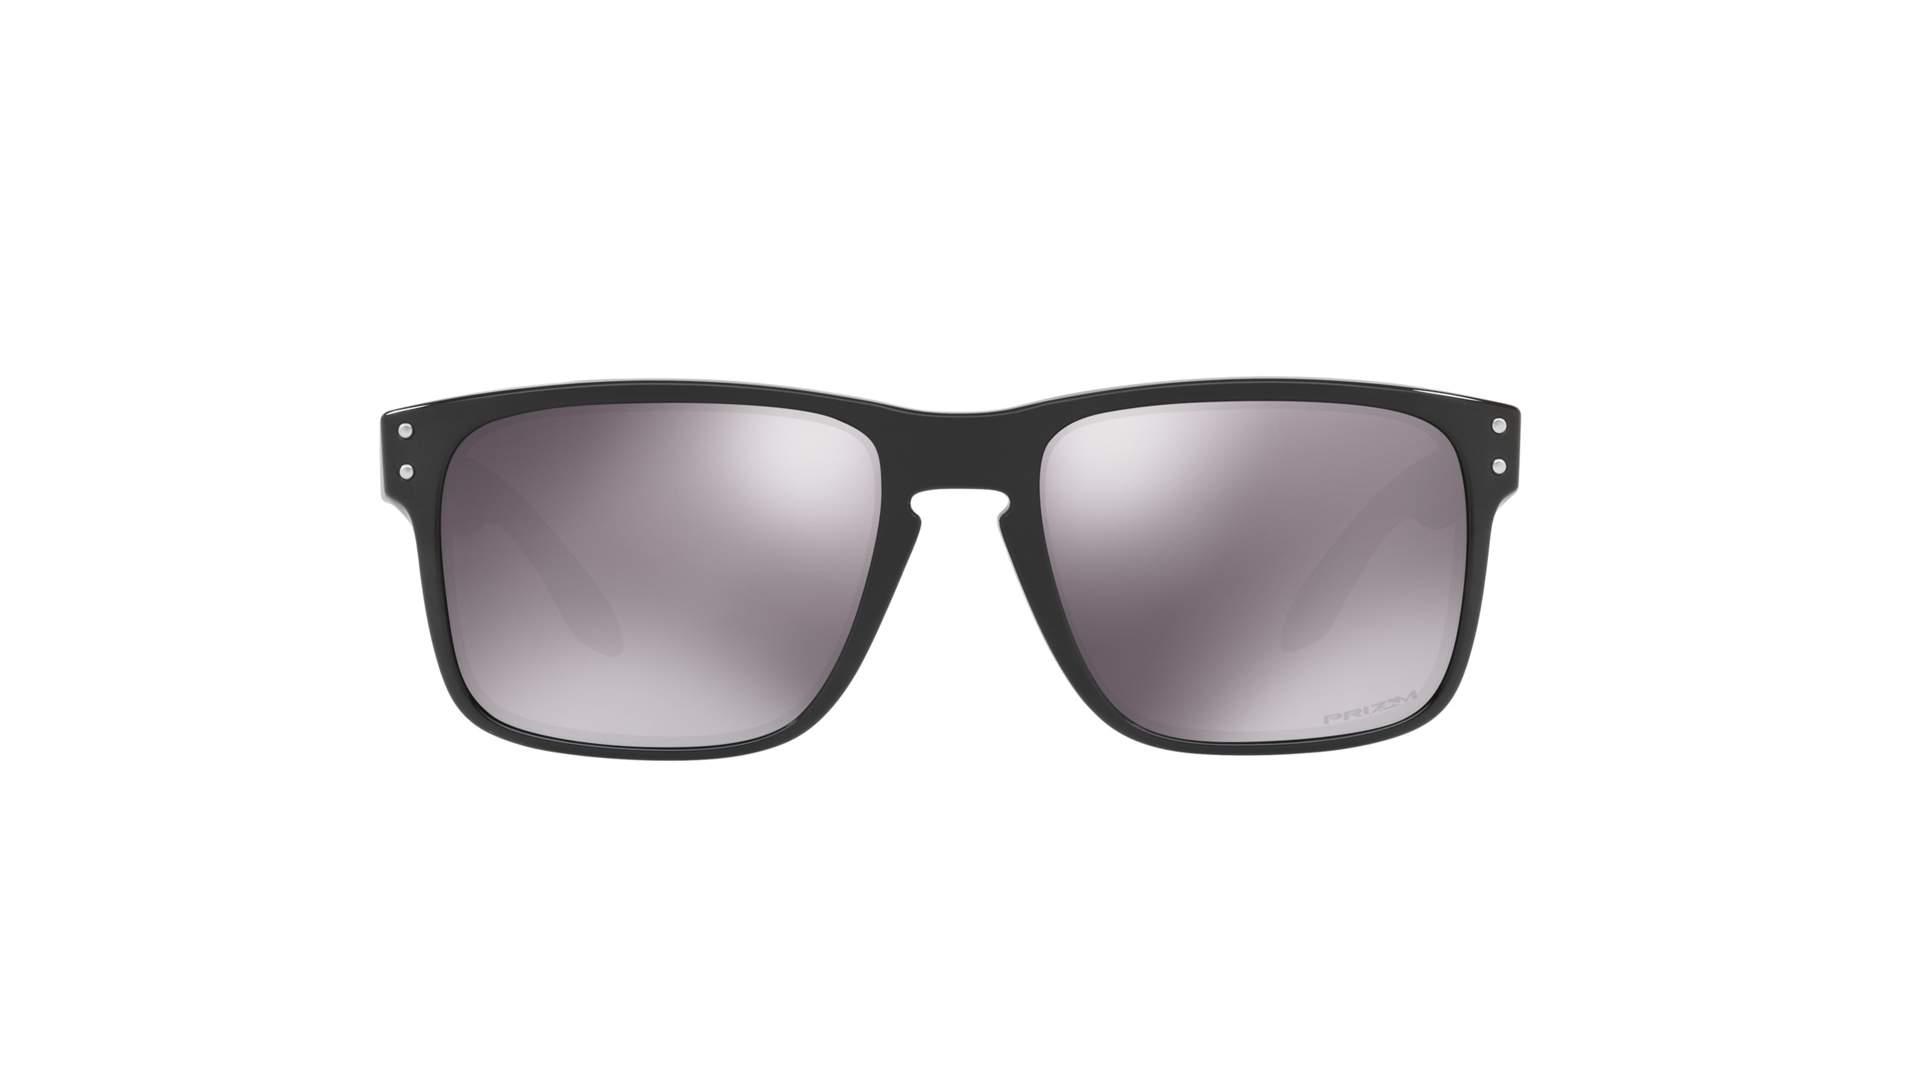 Large E1 Oakley Prizm Noir 55 Holbrook Oo9102 16 Miroirs rCsQthd